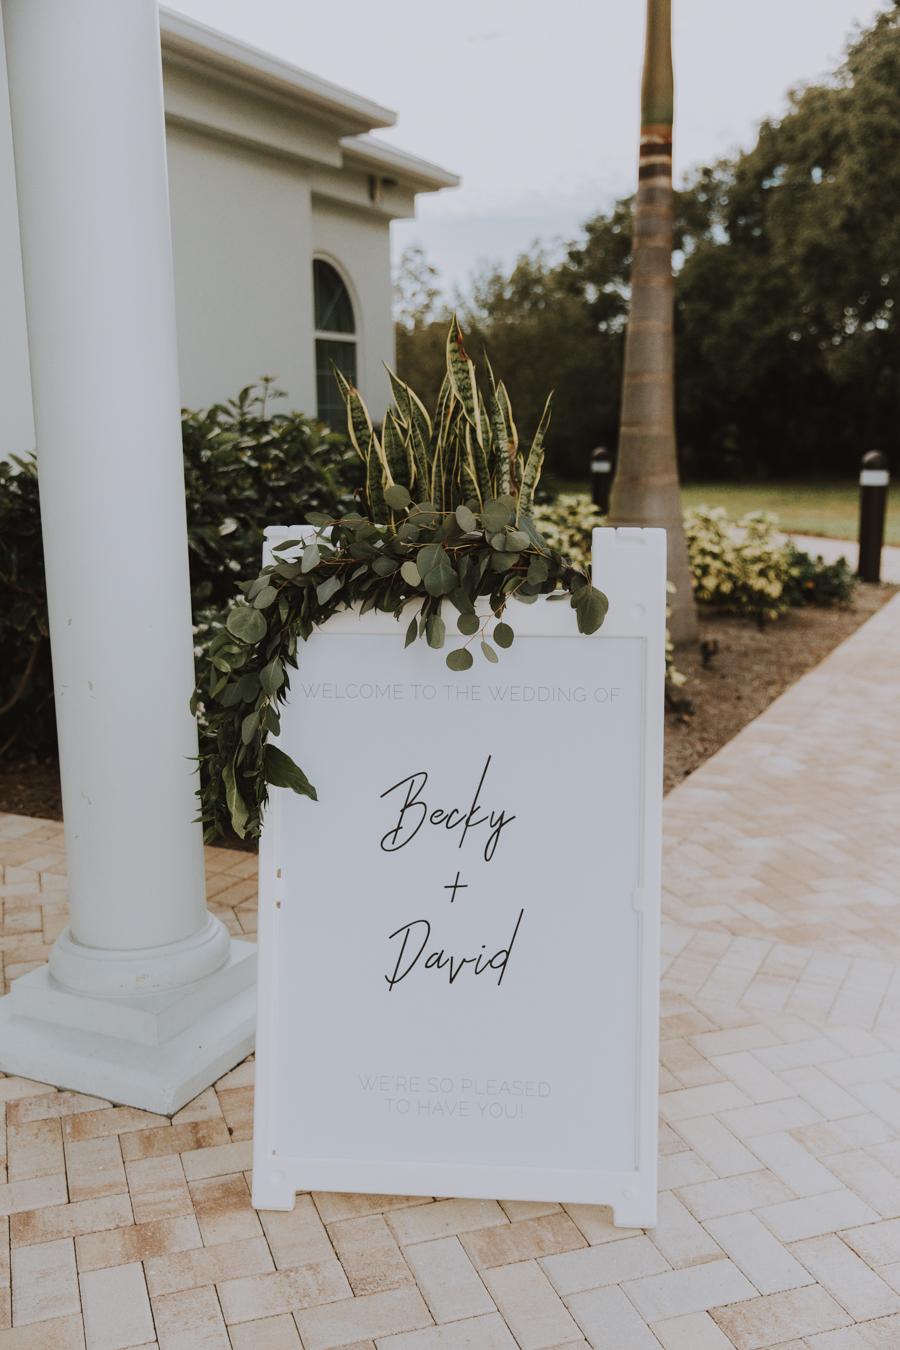 Harborside Chapel Wedding Clearwater Affordable Tampa Venues BHLDN Palm Harbor Safety Harbor Resort and Spa Wedding Malindy Elene Bridal St Pete Wedding Photographer Tampa Wedding Photographer-57.jpg